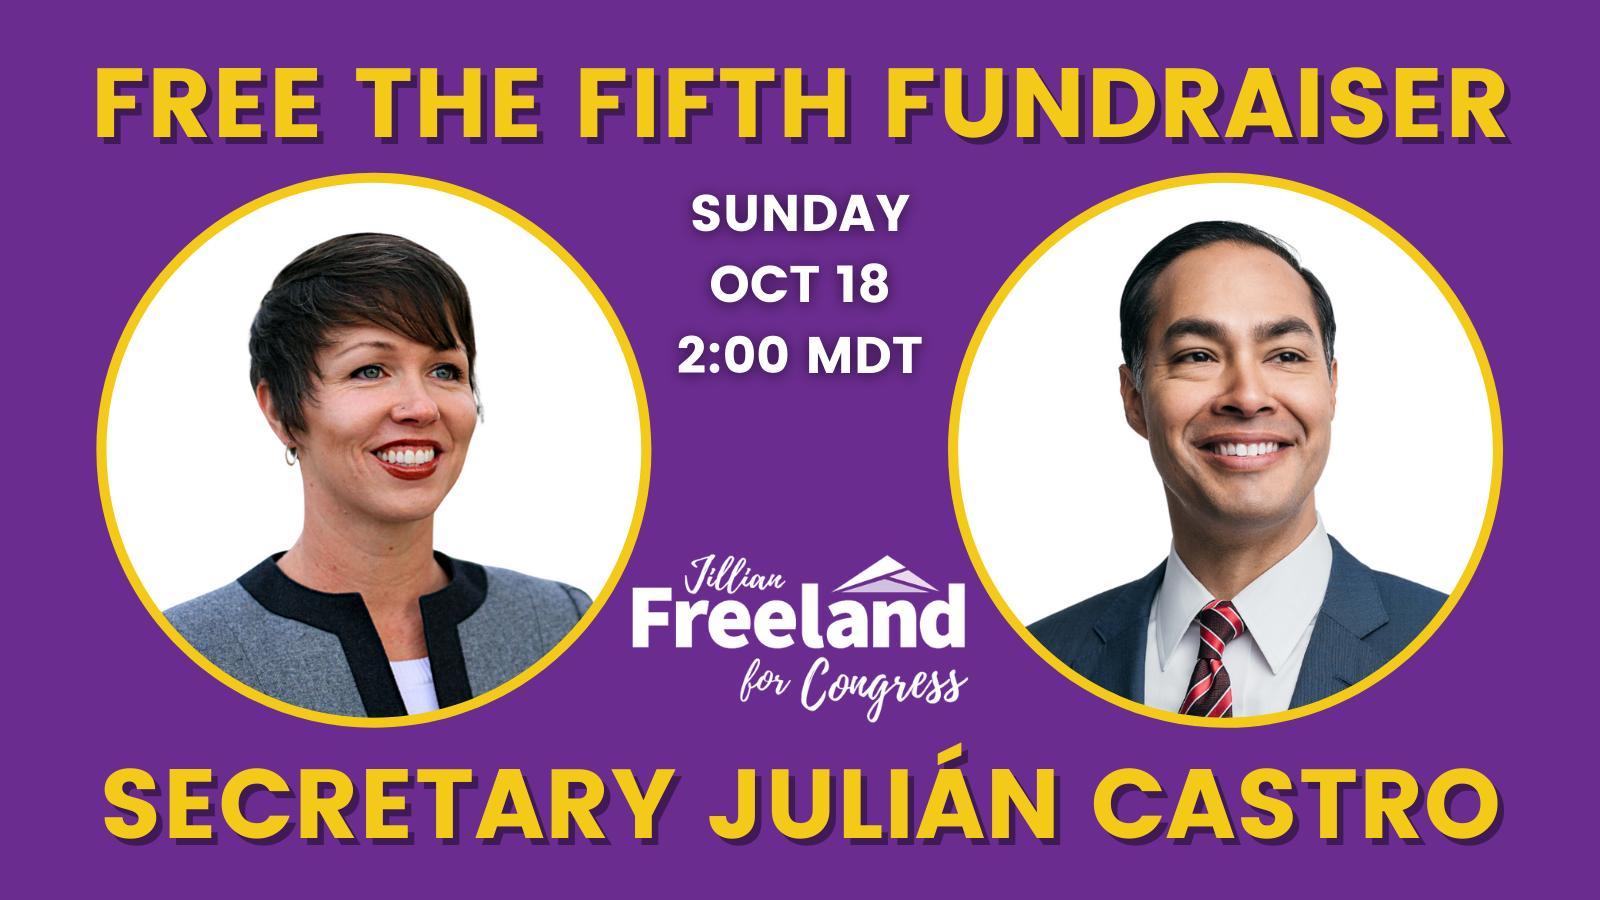 Freeland for Congress